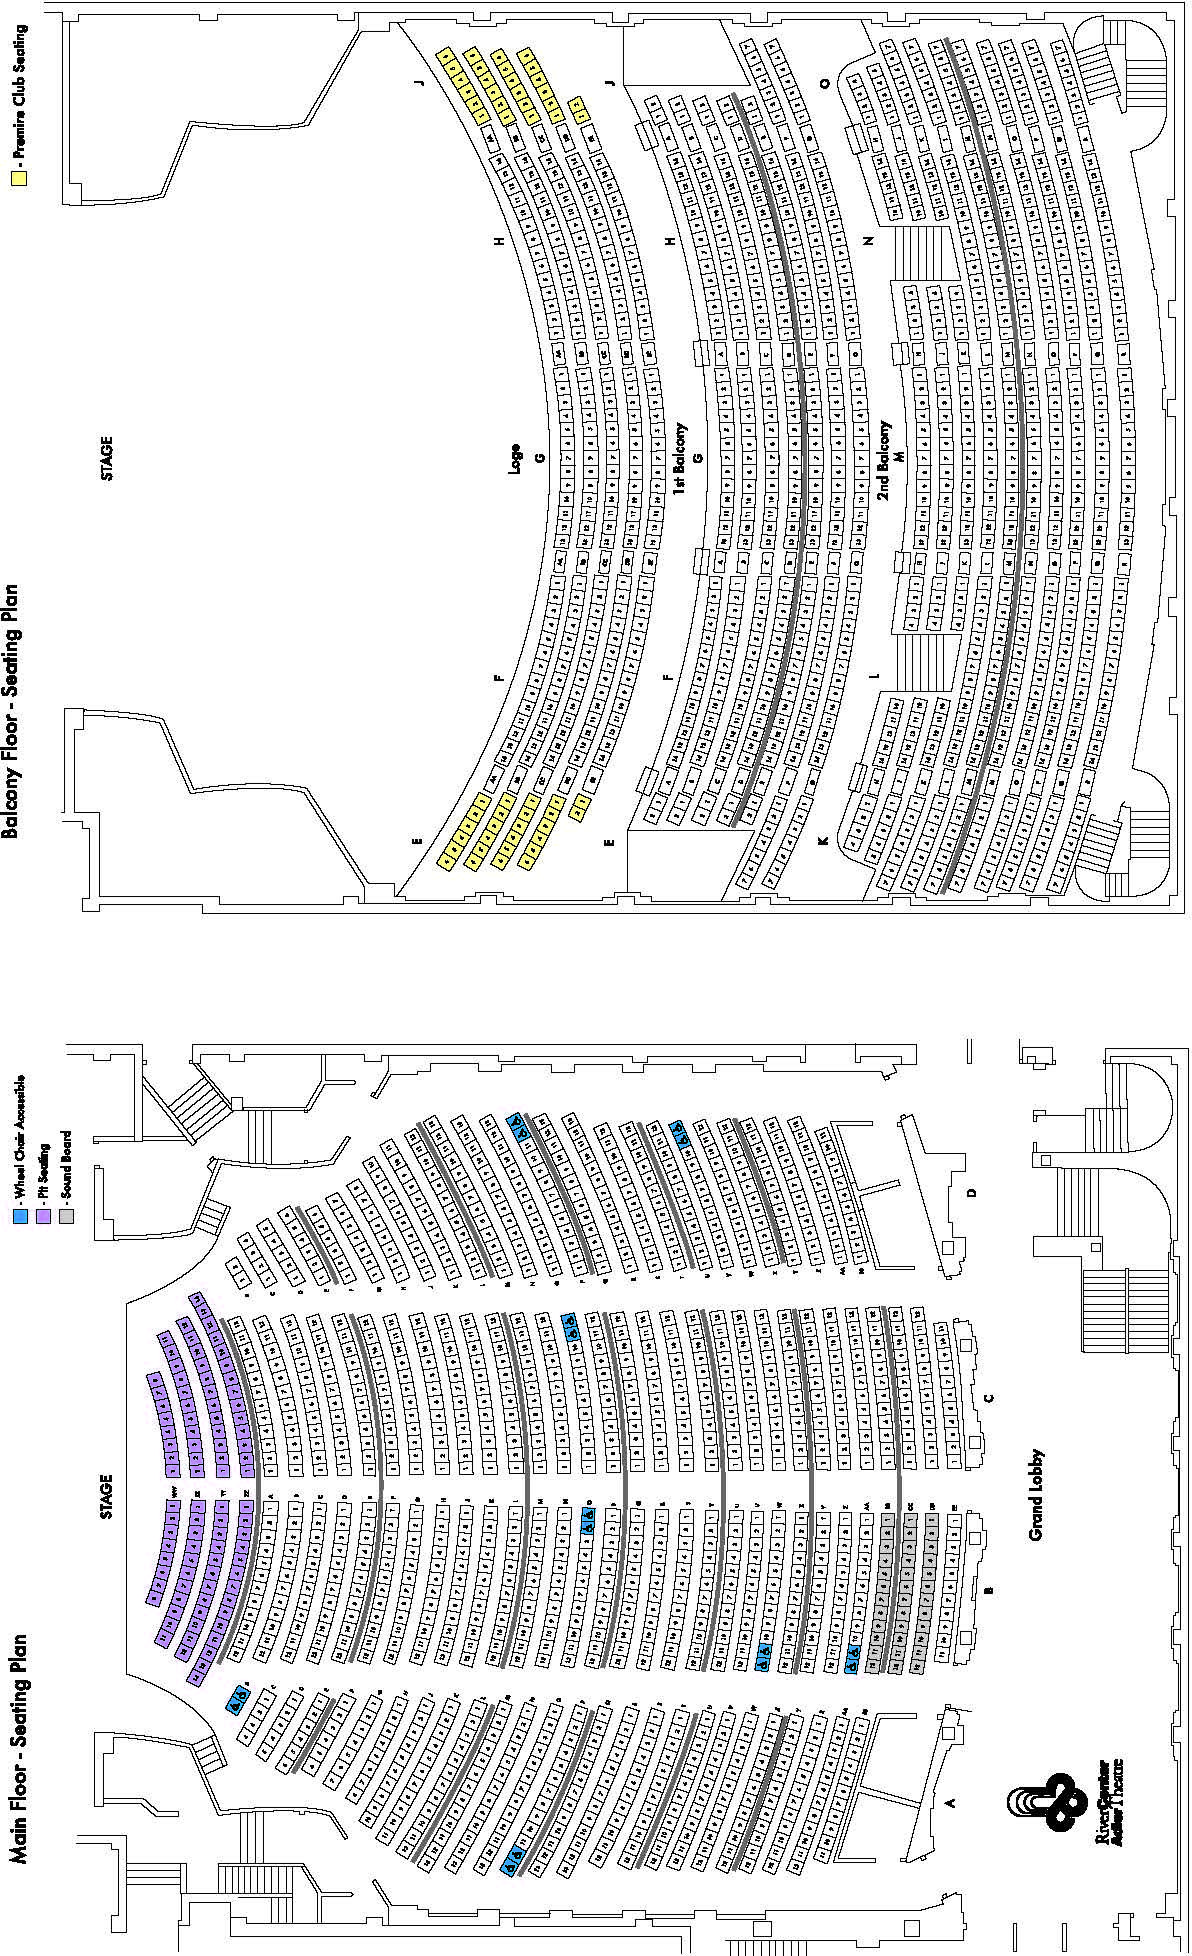 Adler Theater Davenport Iowa Venue Seating Maps